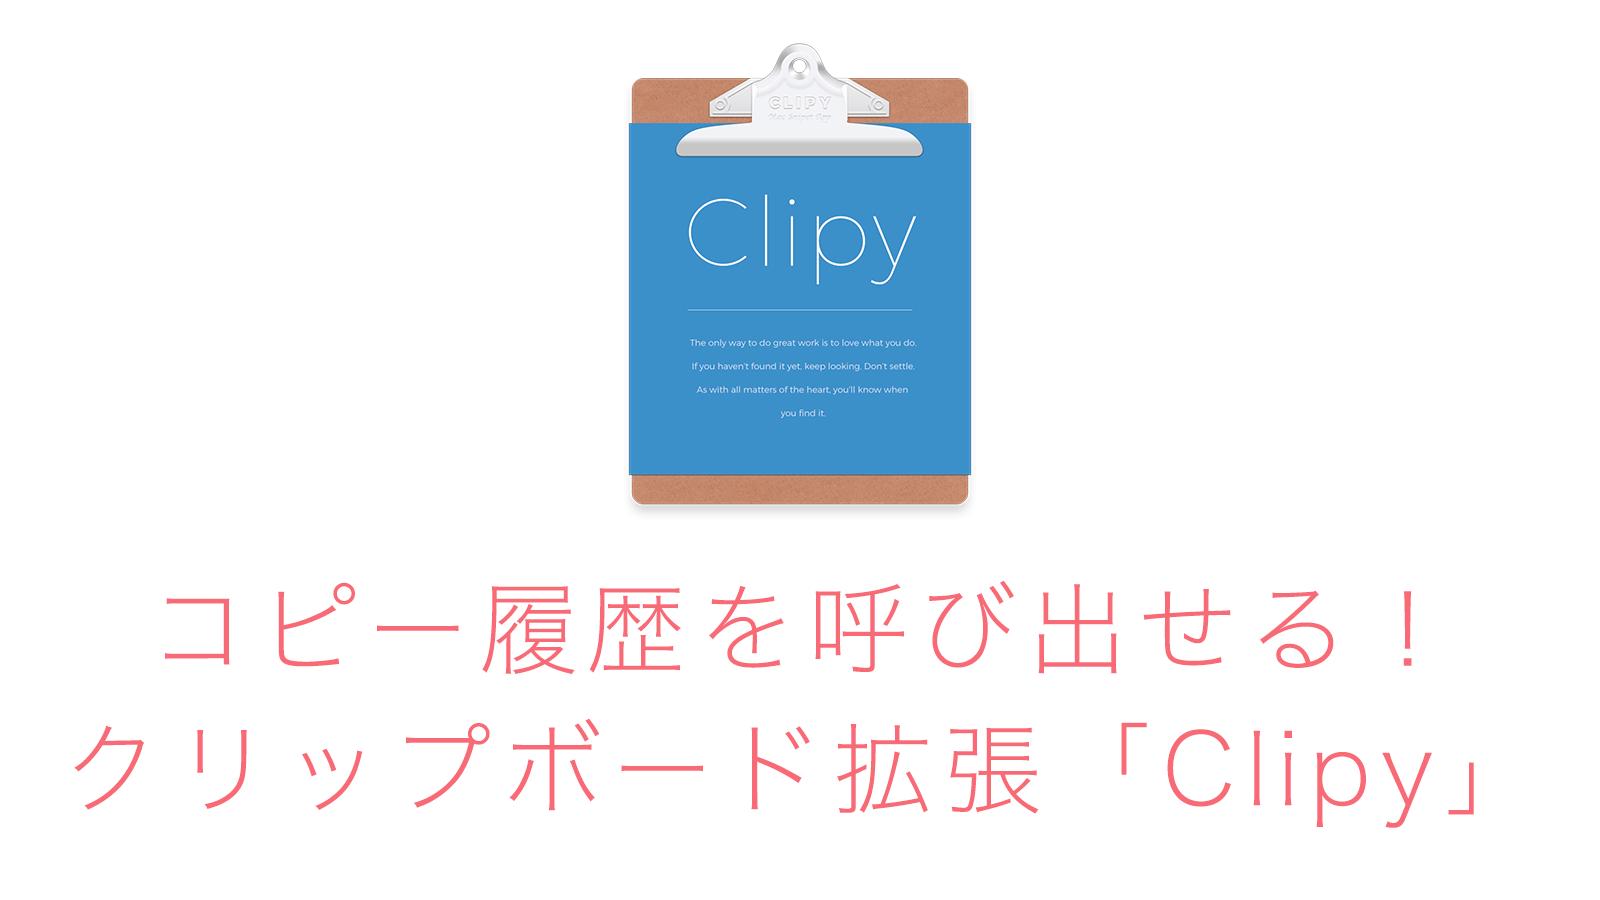 【Mac】うっかり上書きコピー対策に!クリップボード拡張アプリ「Clipy」は1度使うとやめられない!